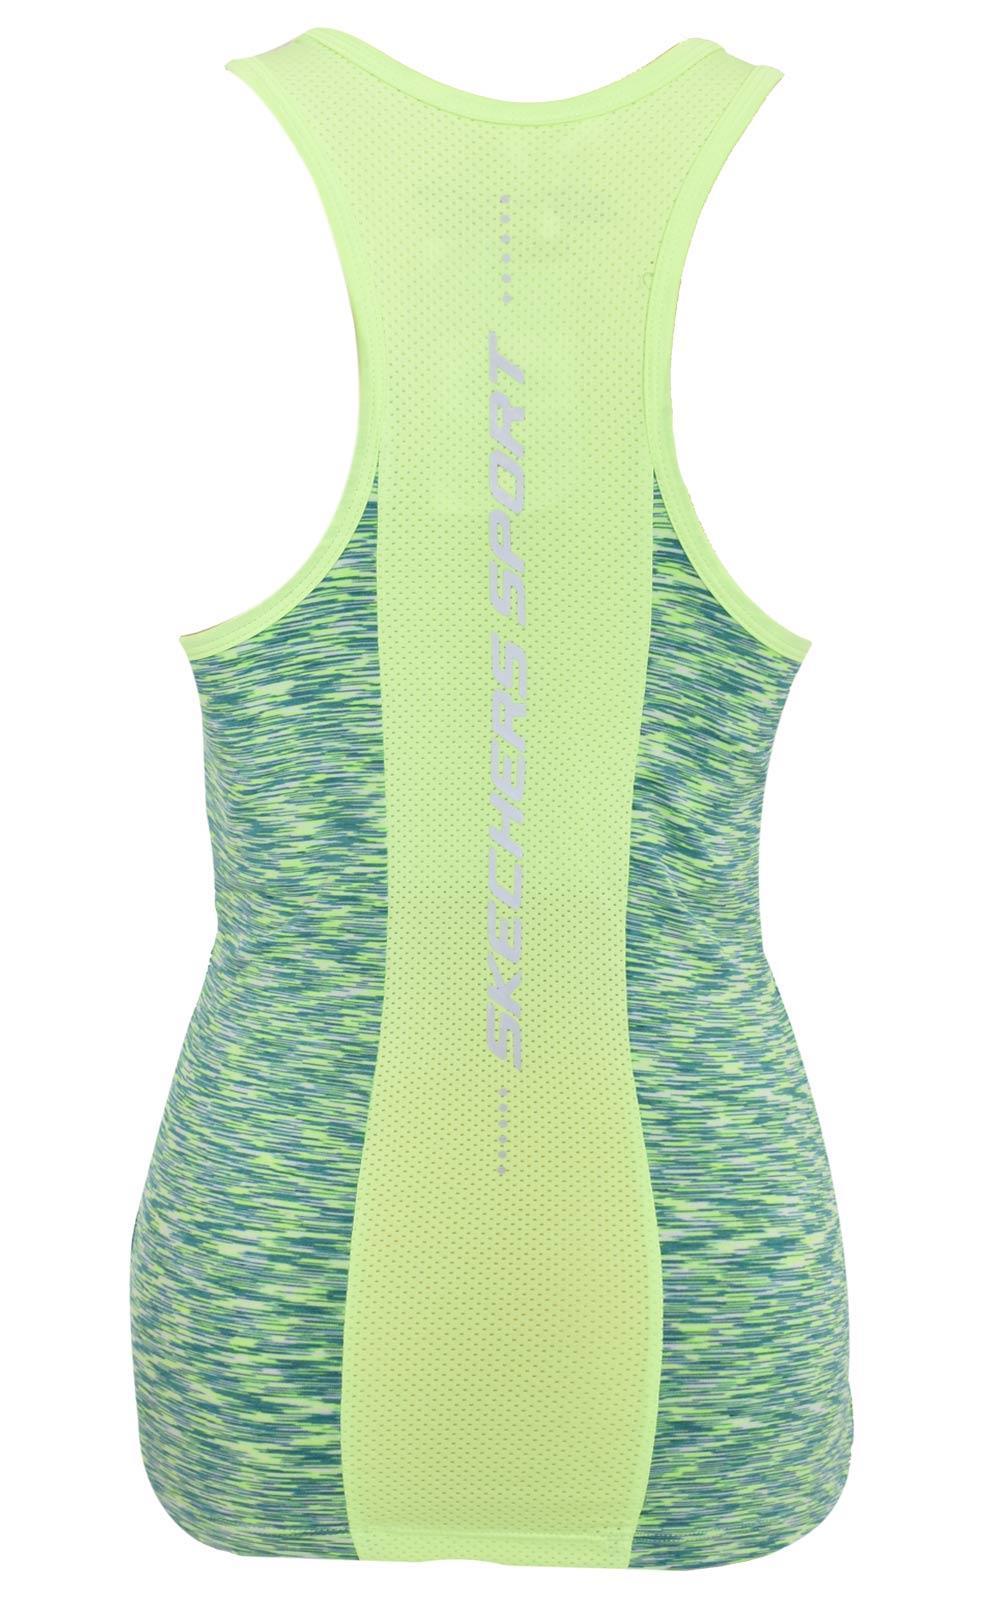 Skechers-senoras-Sujetador-Deportivo-Gimnasio-Atletico-textura-de-malla-Top-Yoga-Chaleco-Active-Wear miniatura 10